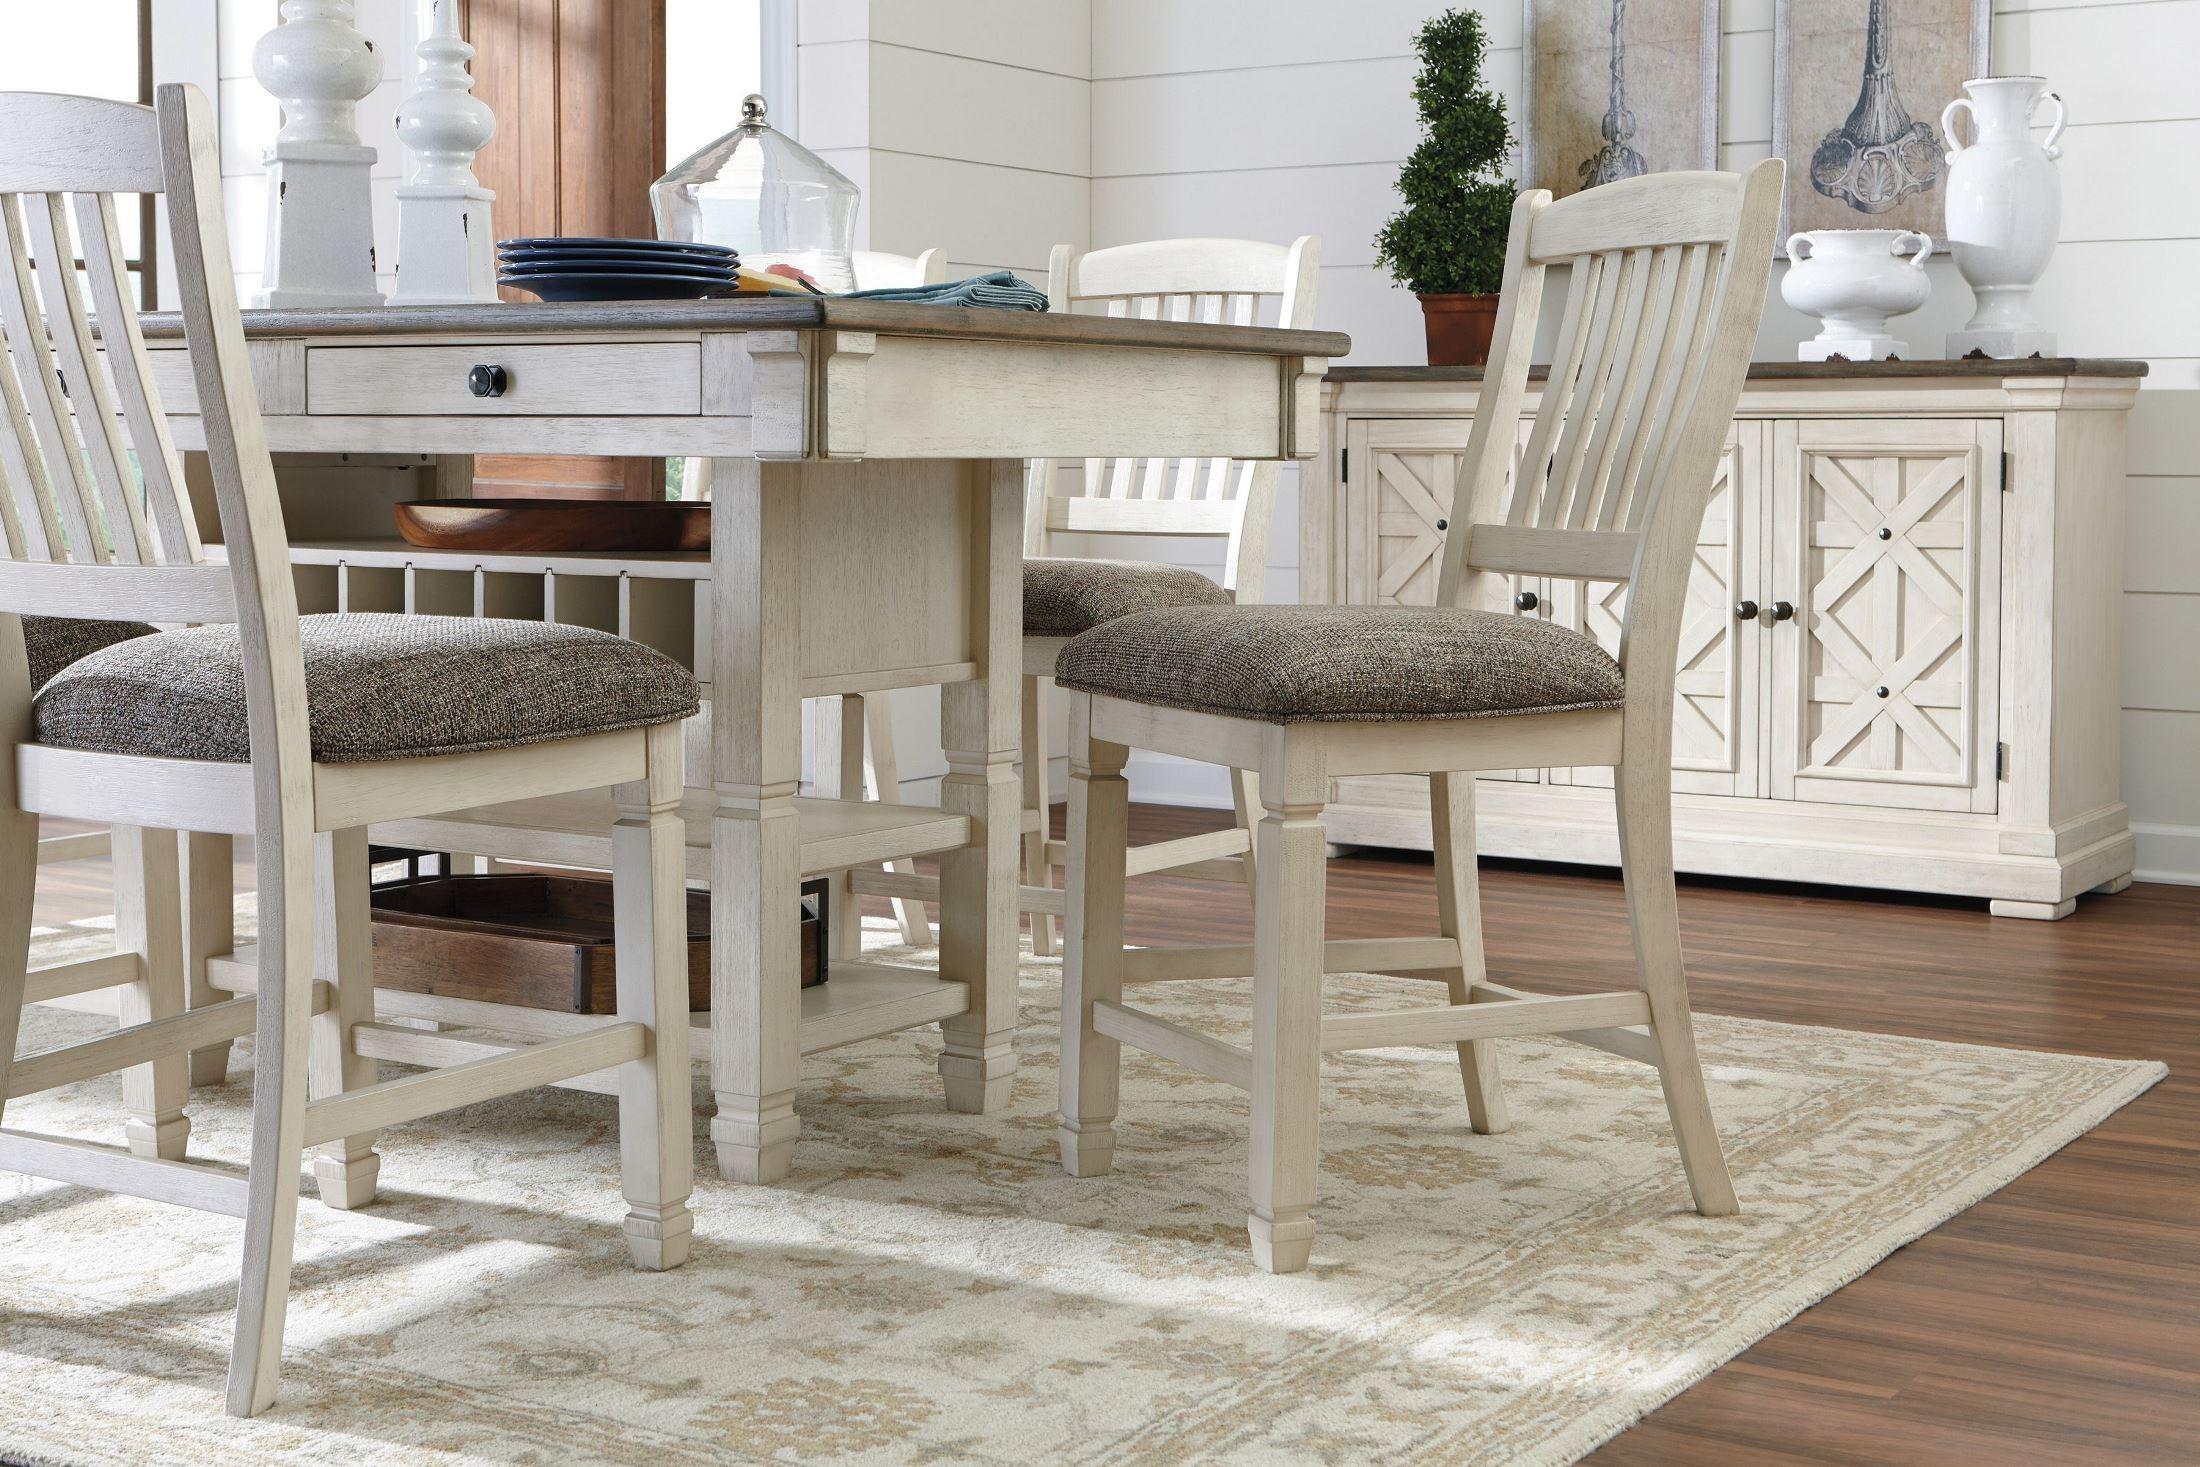 Counter Height Rectangular Dining Set : ... and Gray Rectangular Counter Height Dining Room Set, D647-32, Ashley